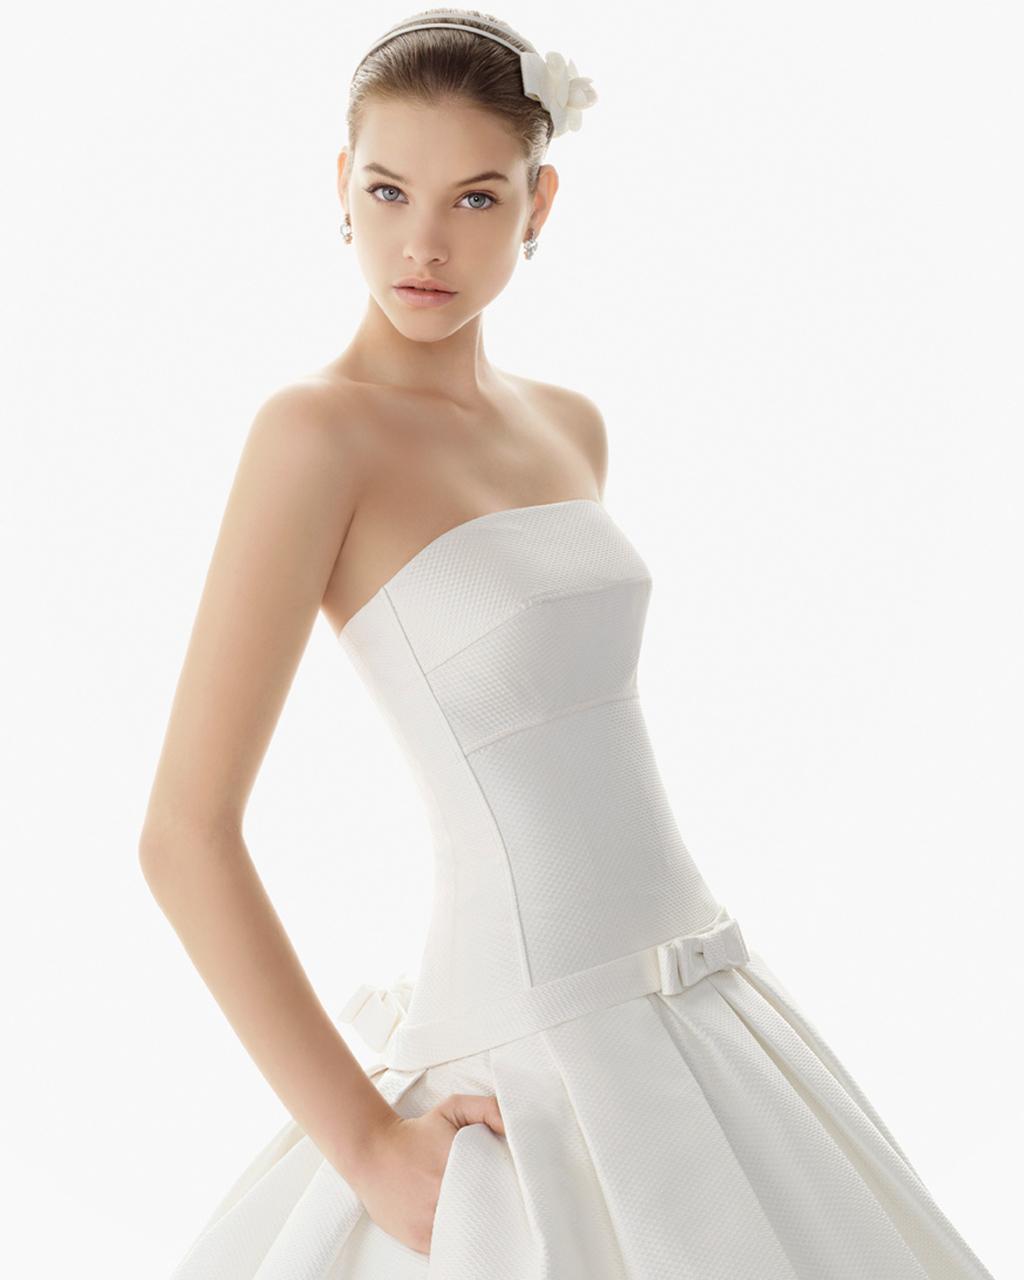 Transforming-wedding-dresses-2013-bridal-gown-by-rosa-clara-9.full